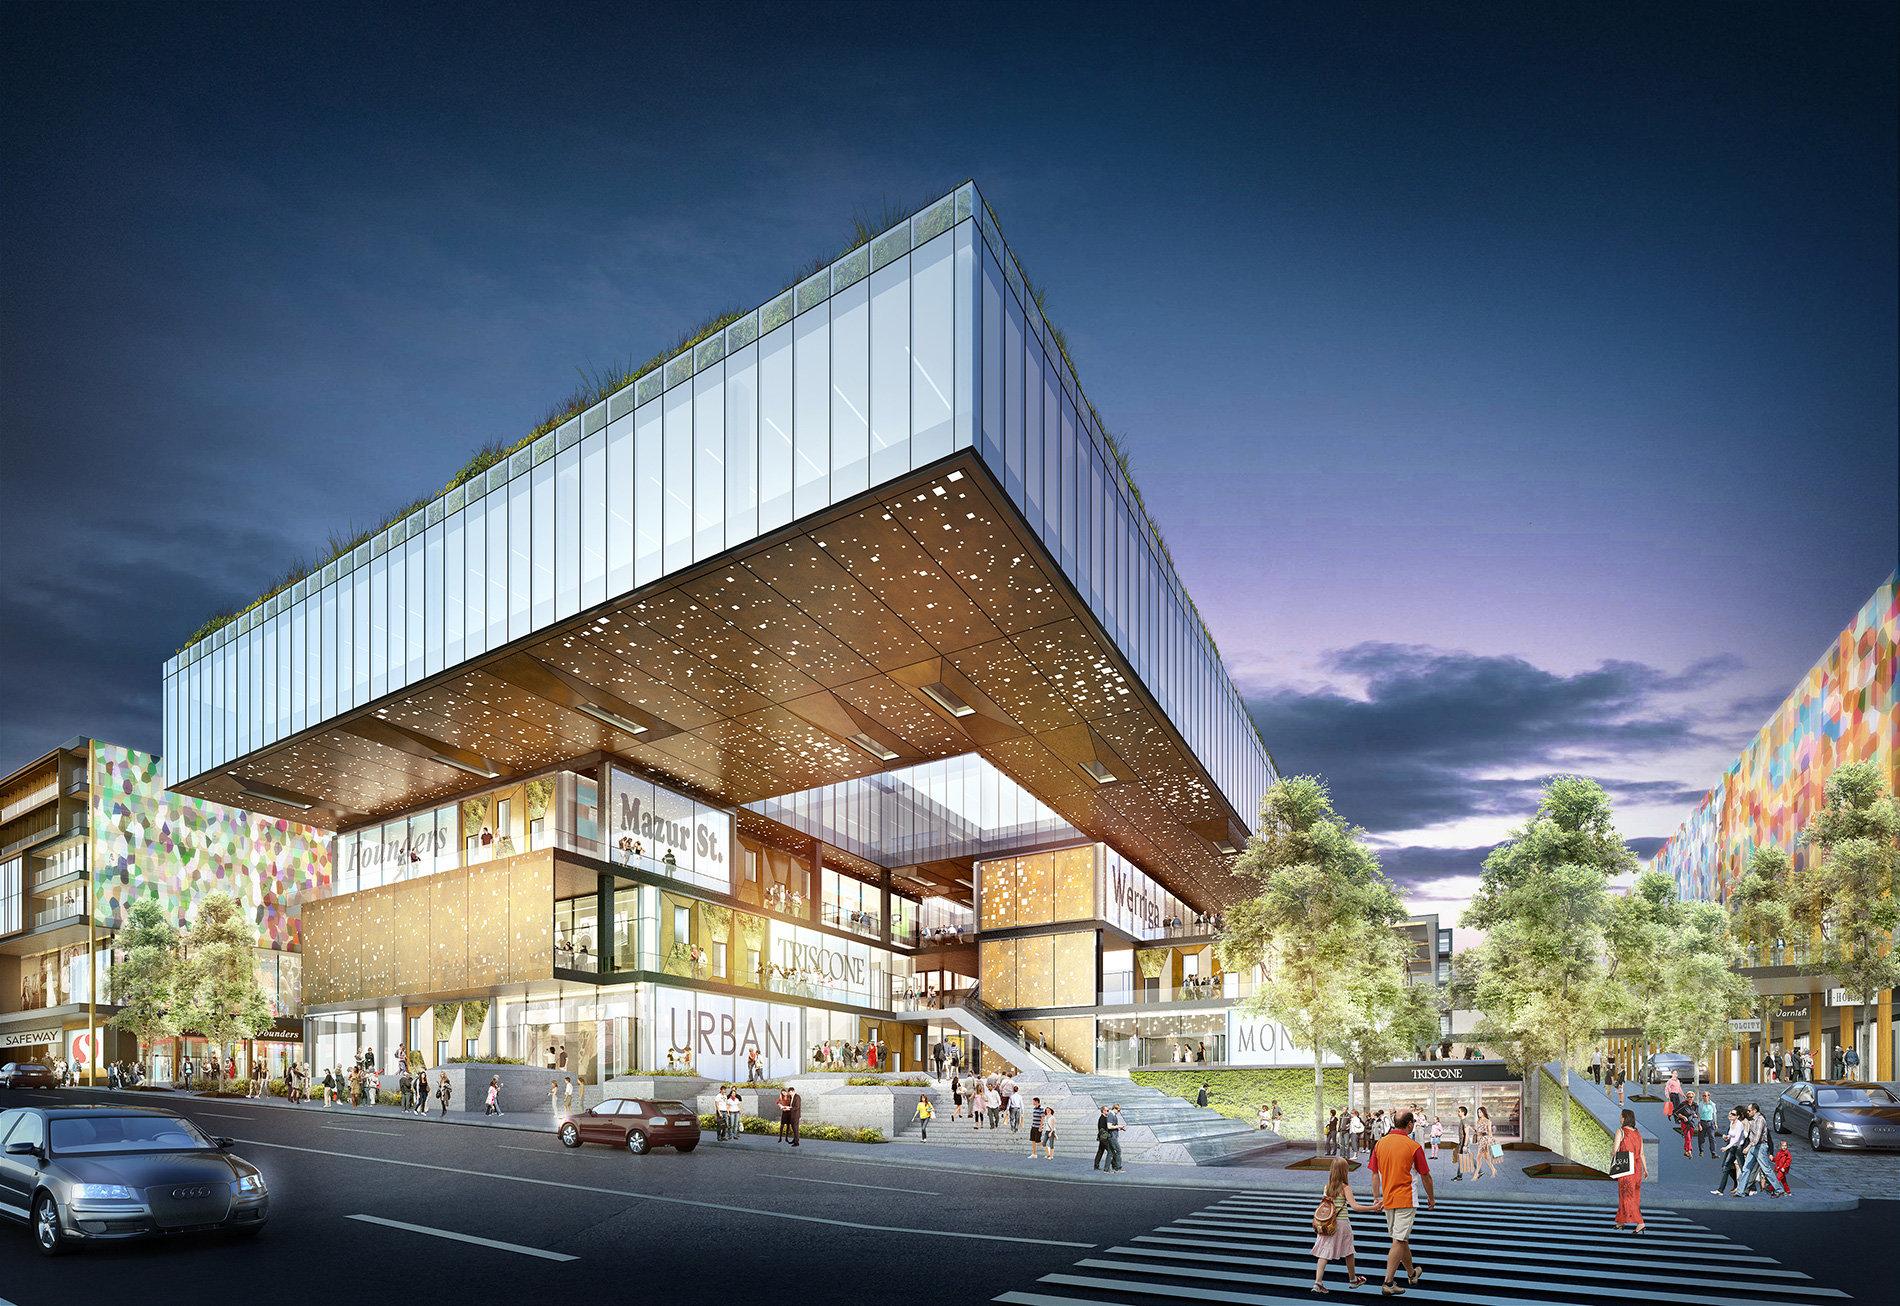 Rendering Reveal For New Potrero Center Mixed Use Development